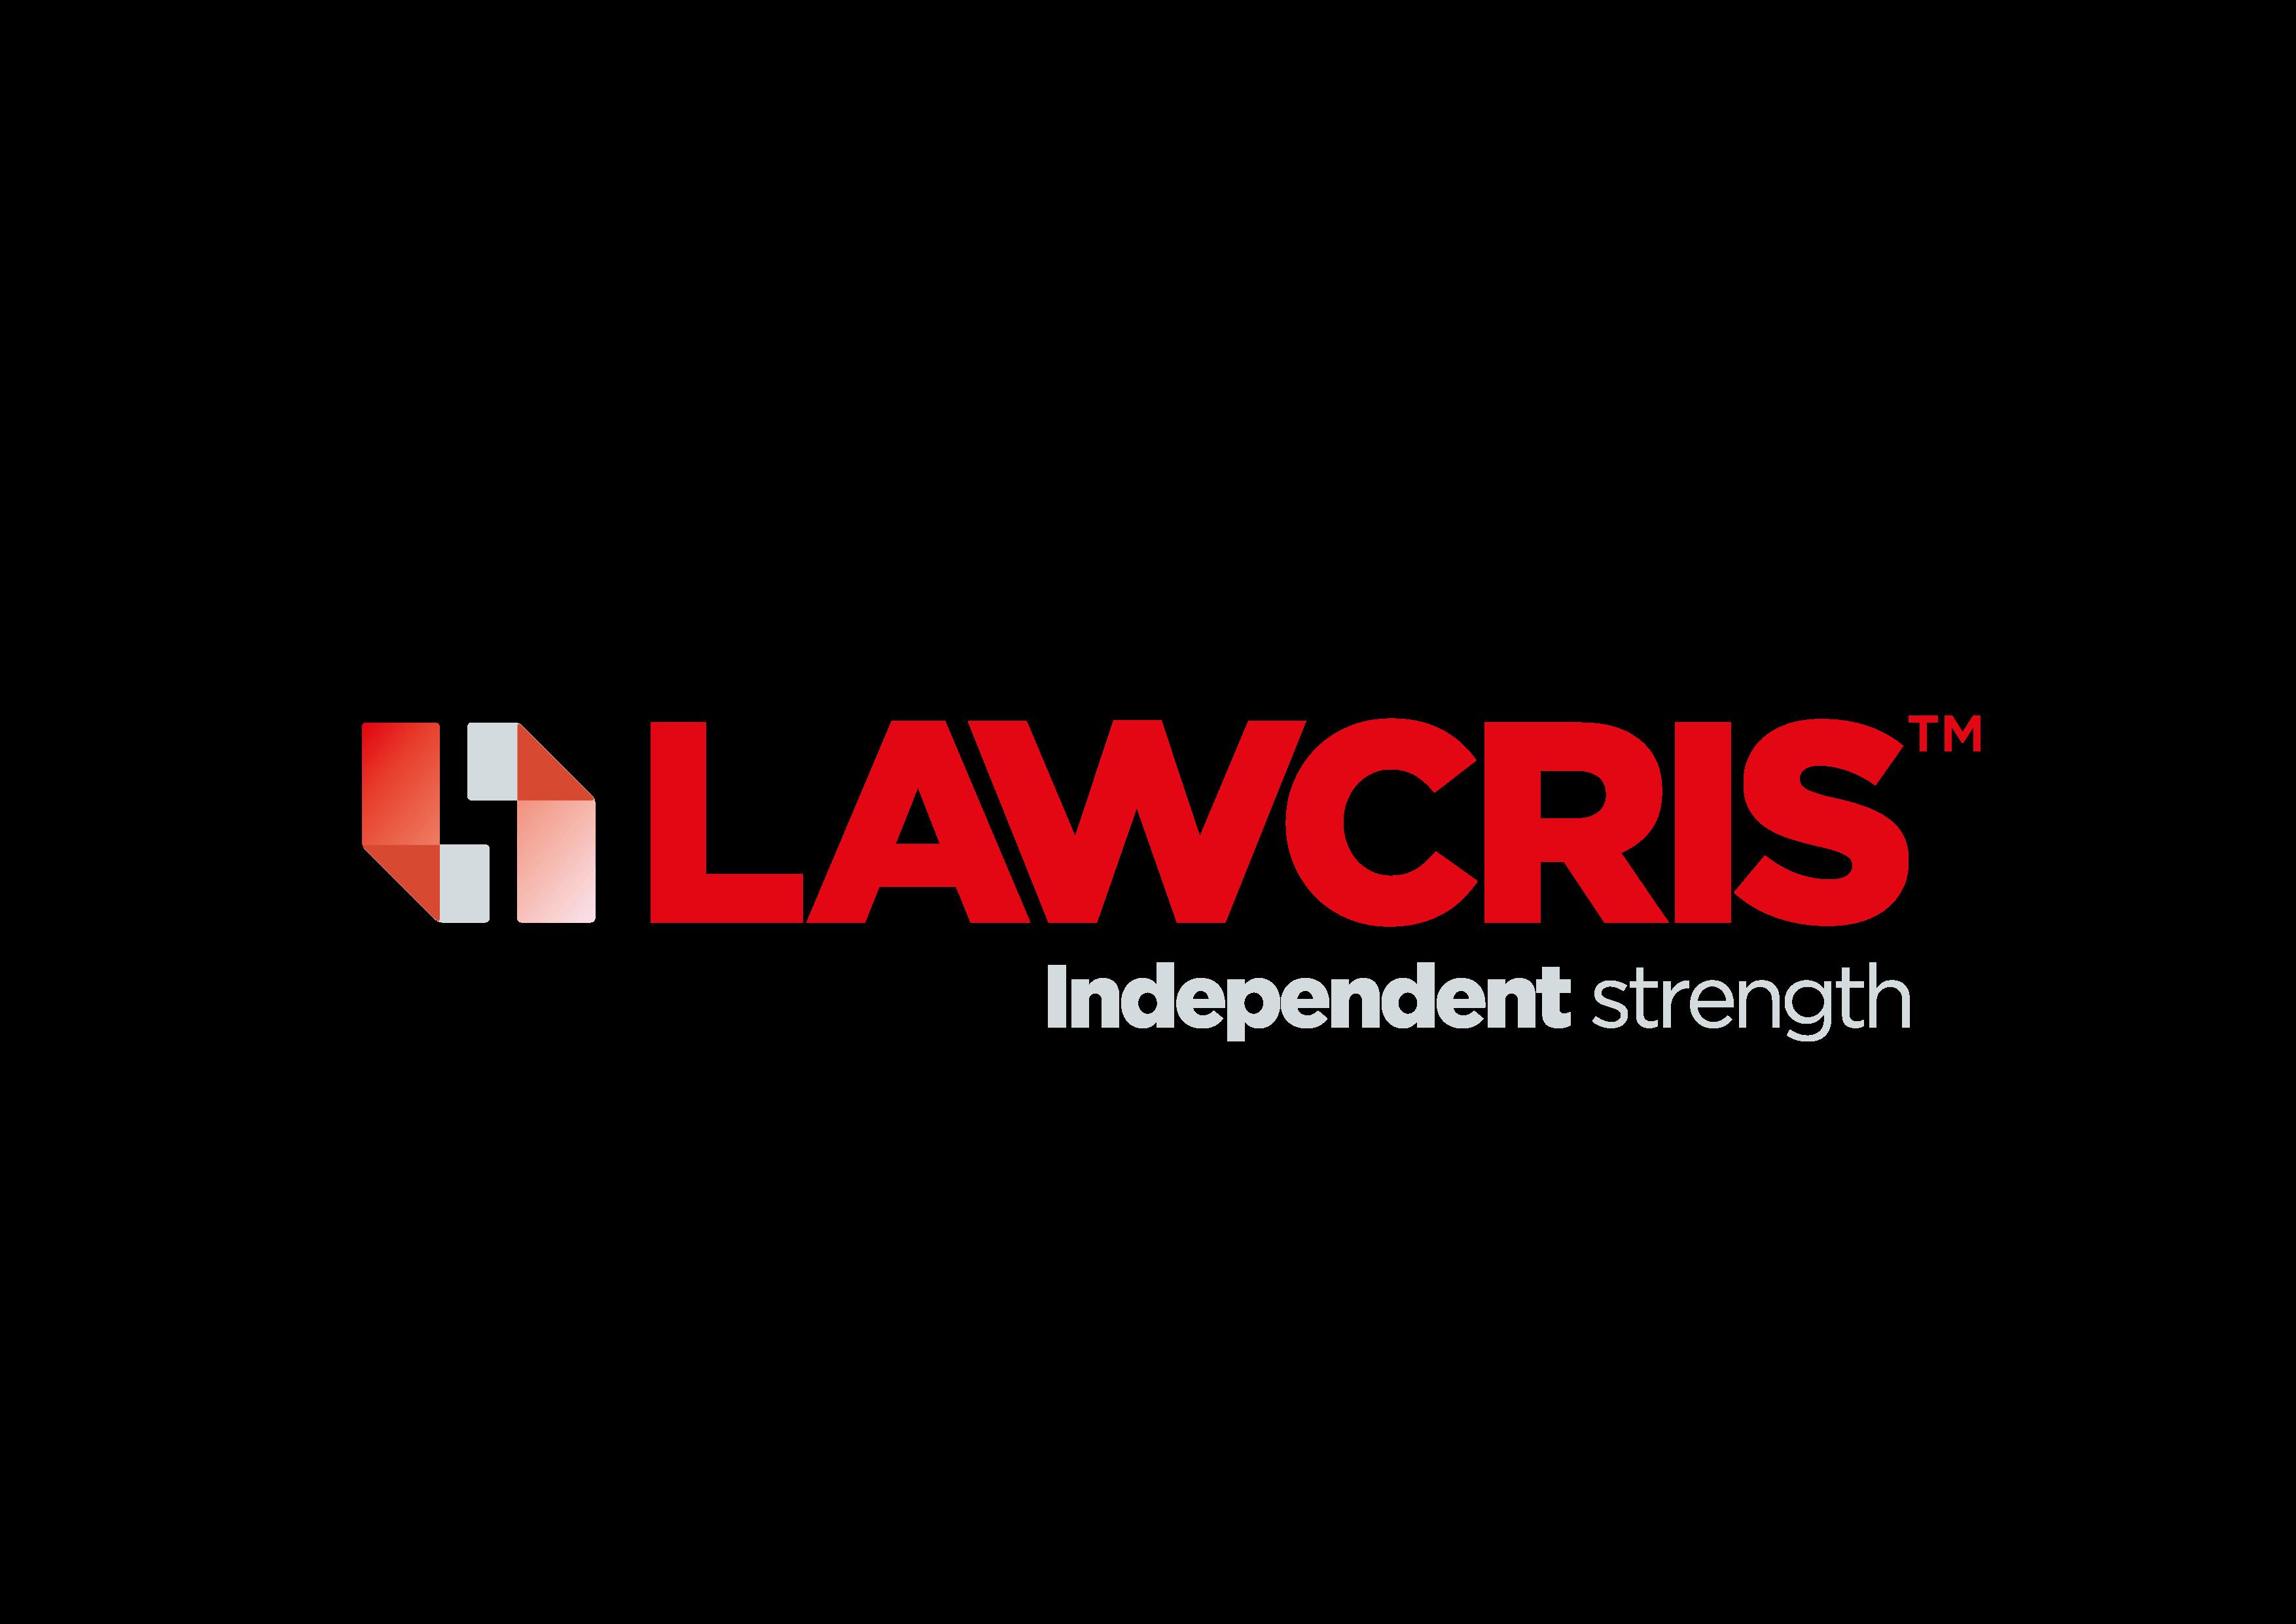 Lawcris logo